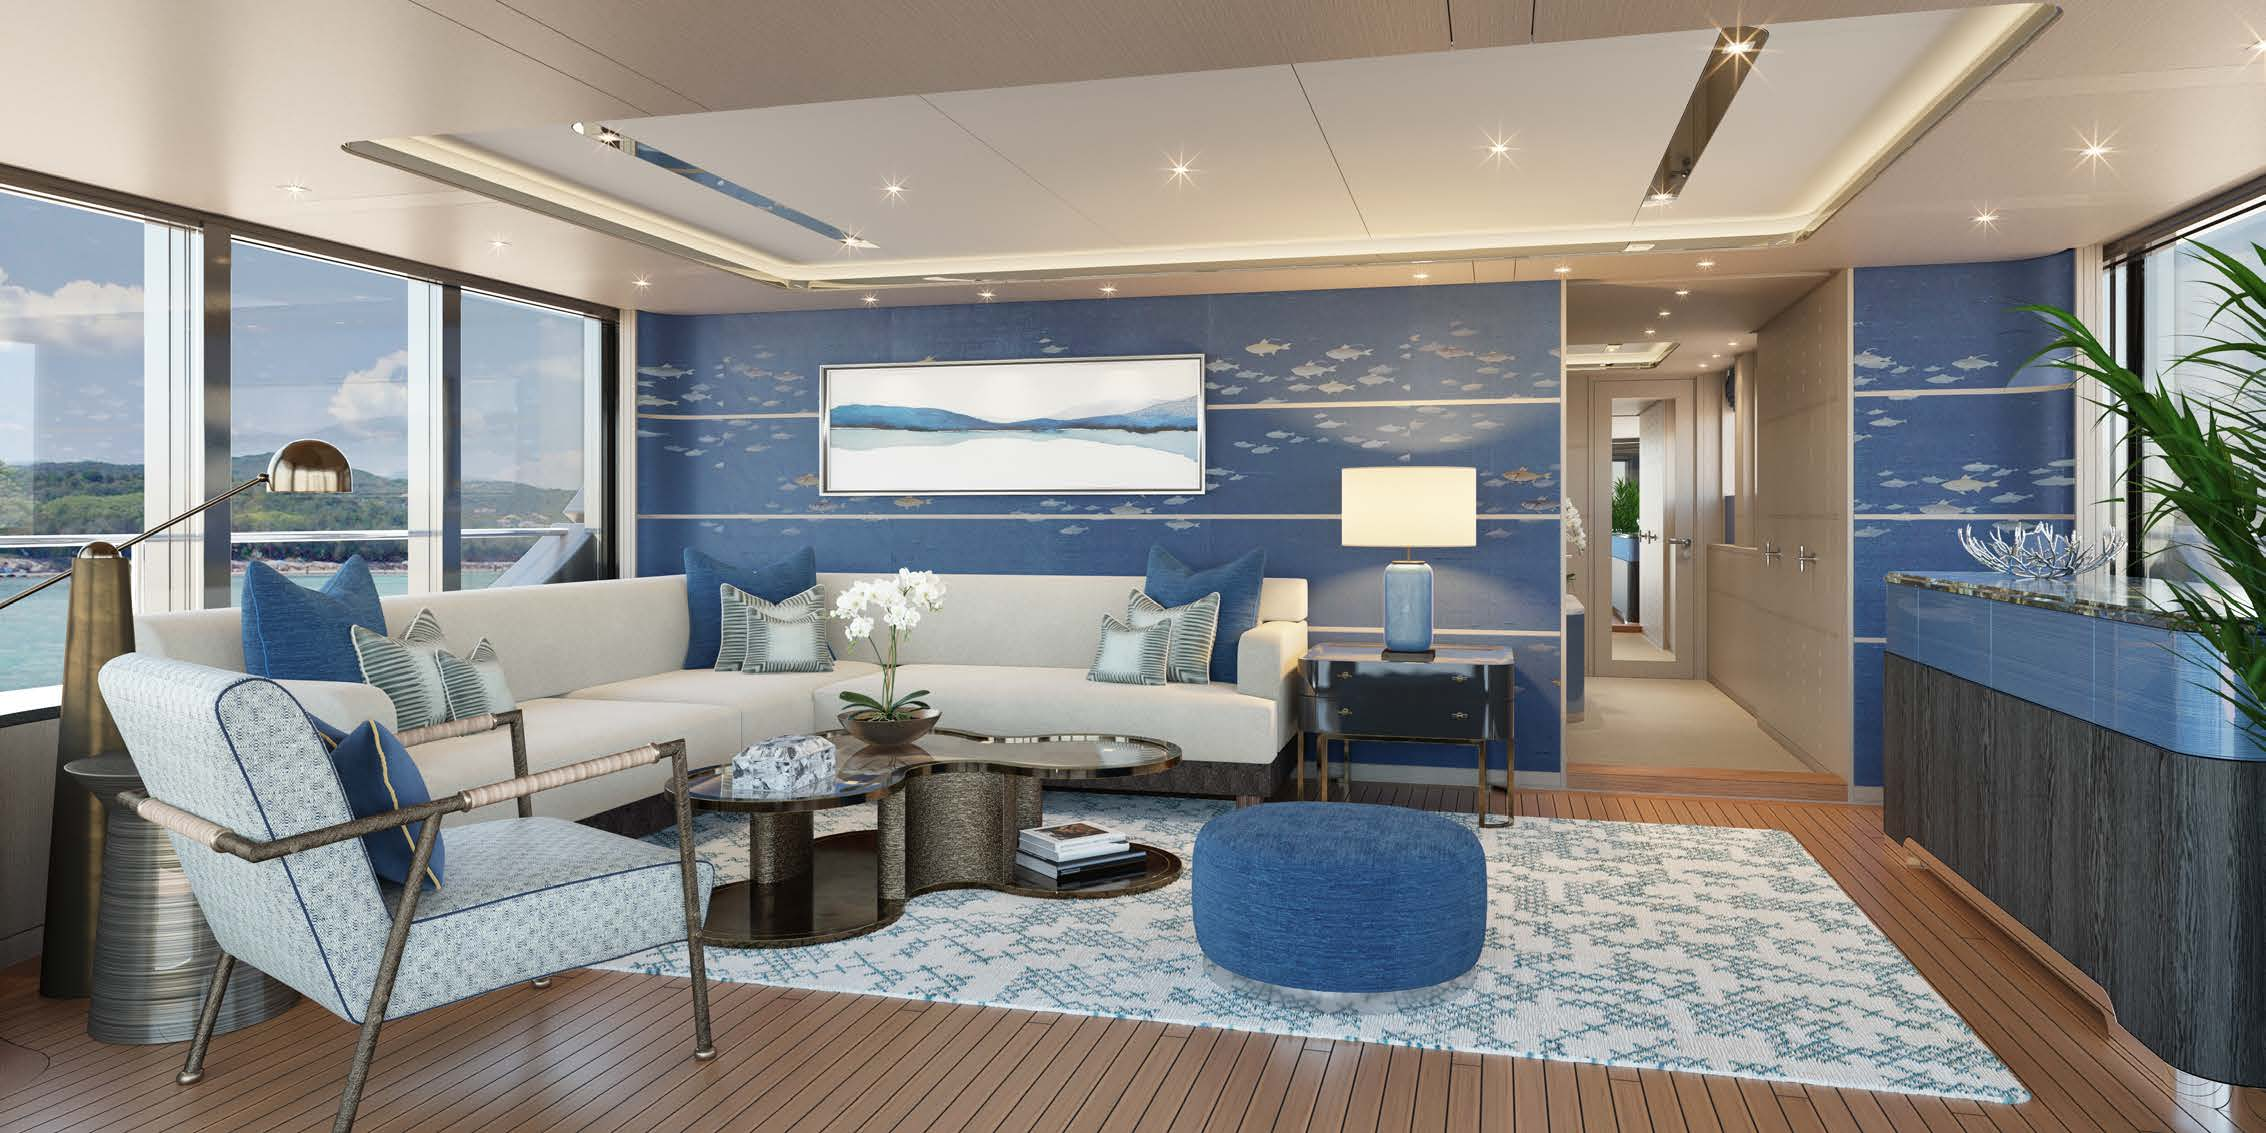 M/Y MOONEN Y201 yacht for sale salon